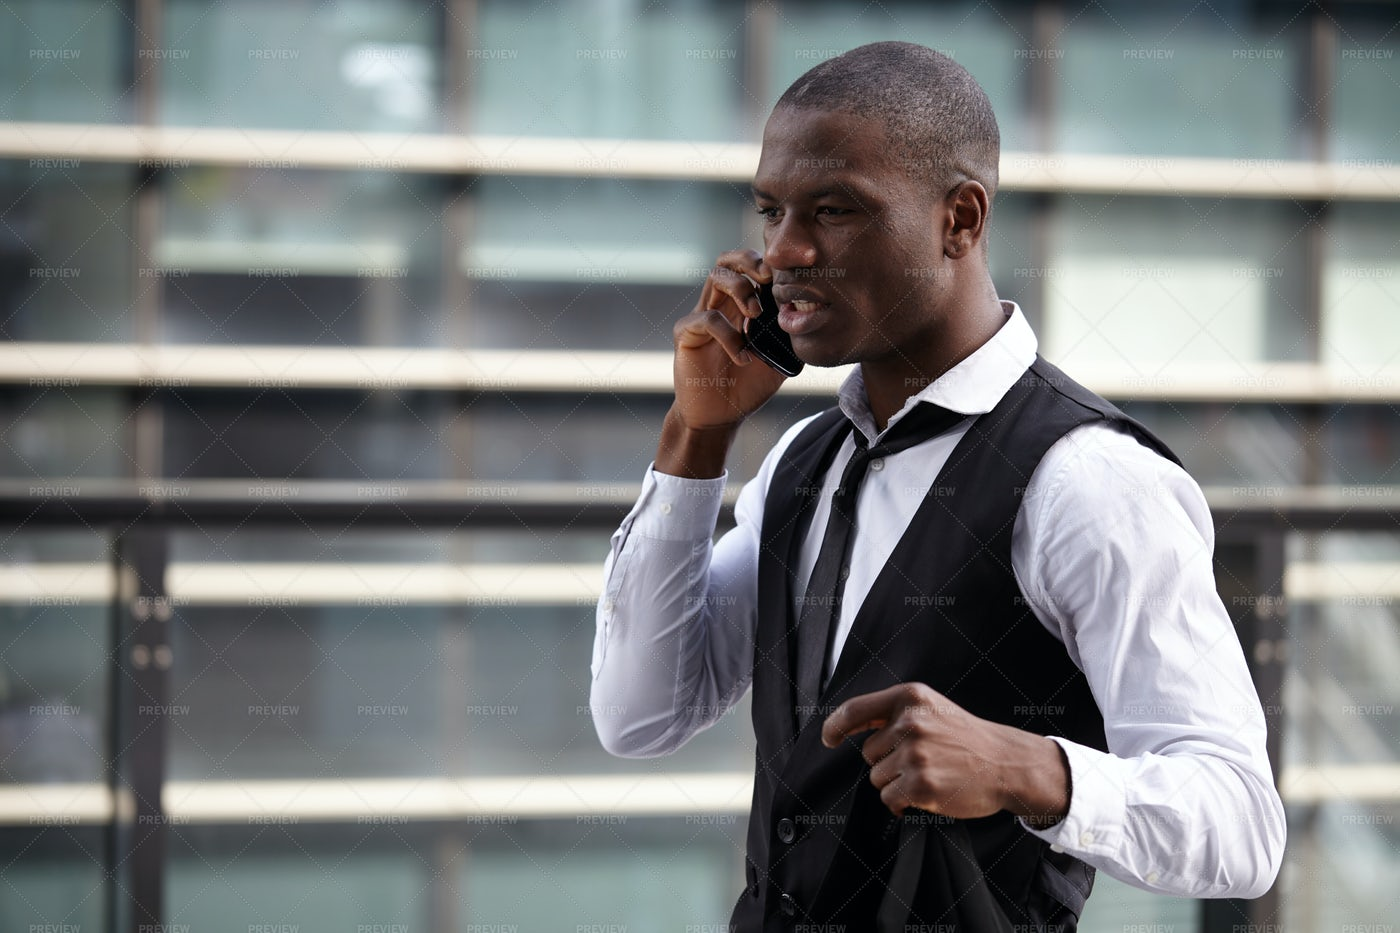 Man Talking On The Phone: Stock Photos